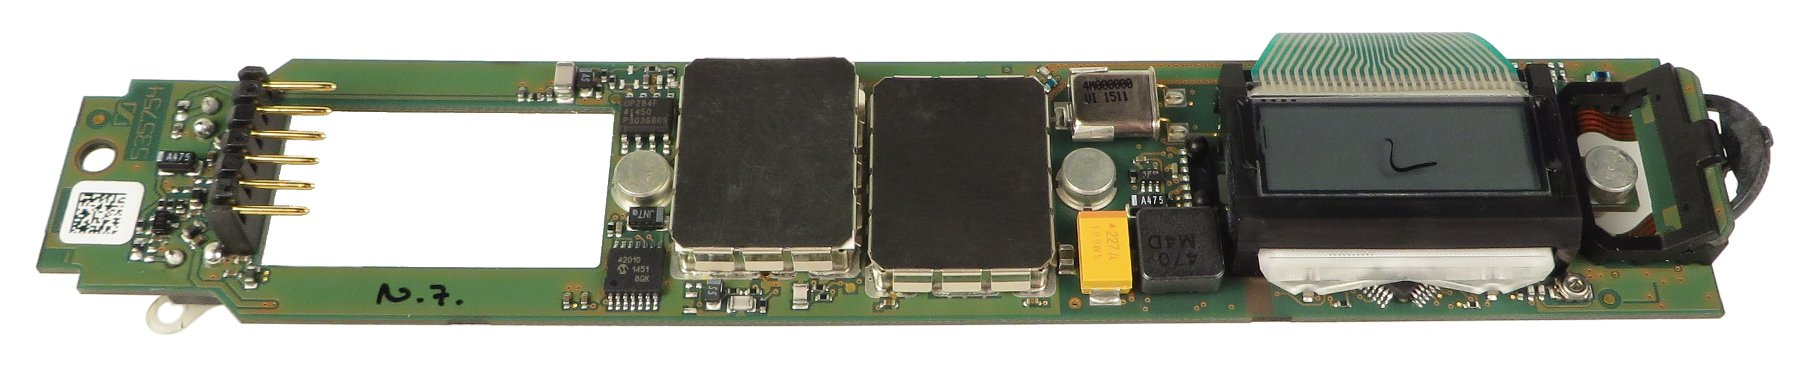 470-638 MHZ RF PCB for SKM5200-II-L